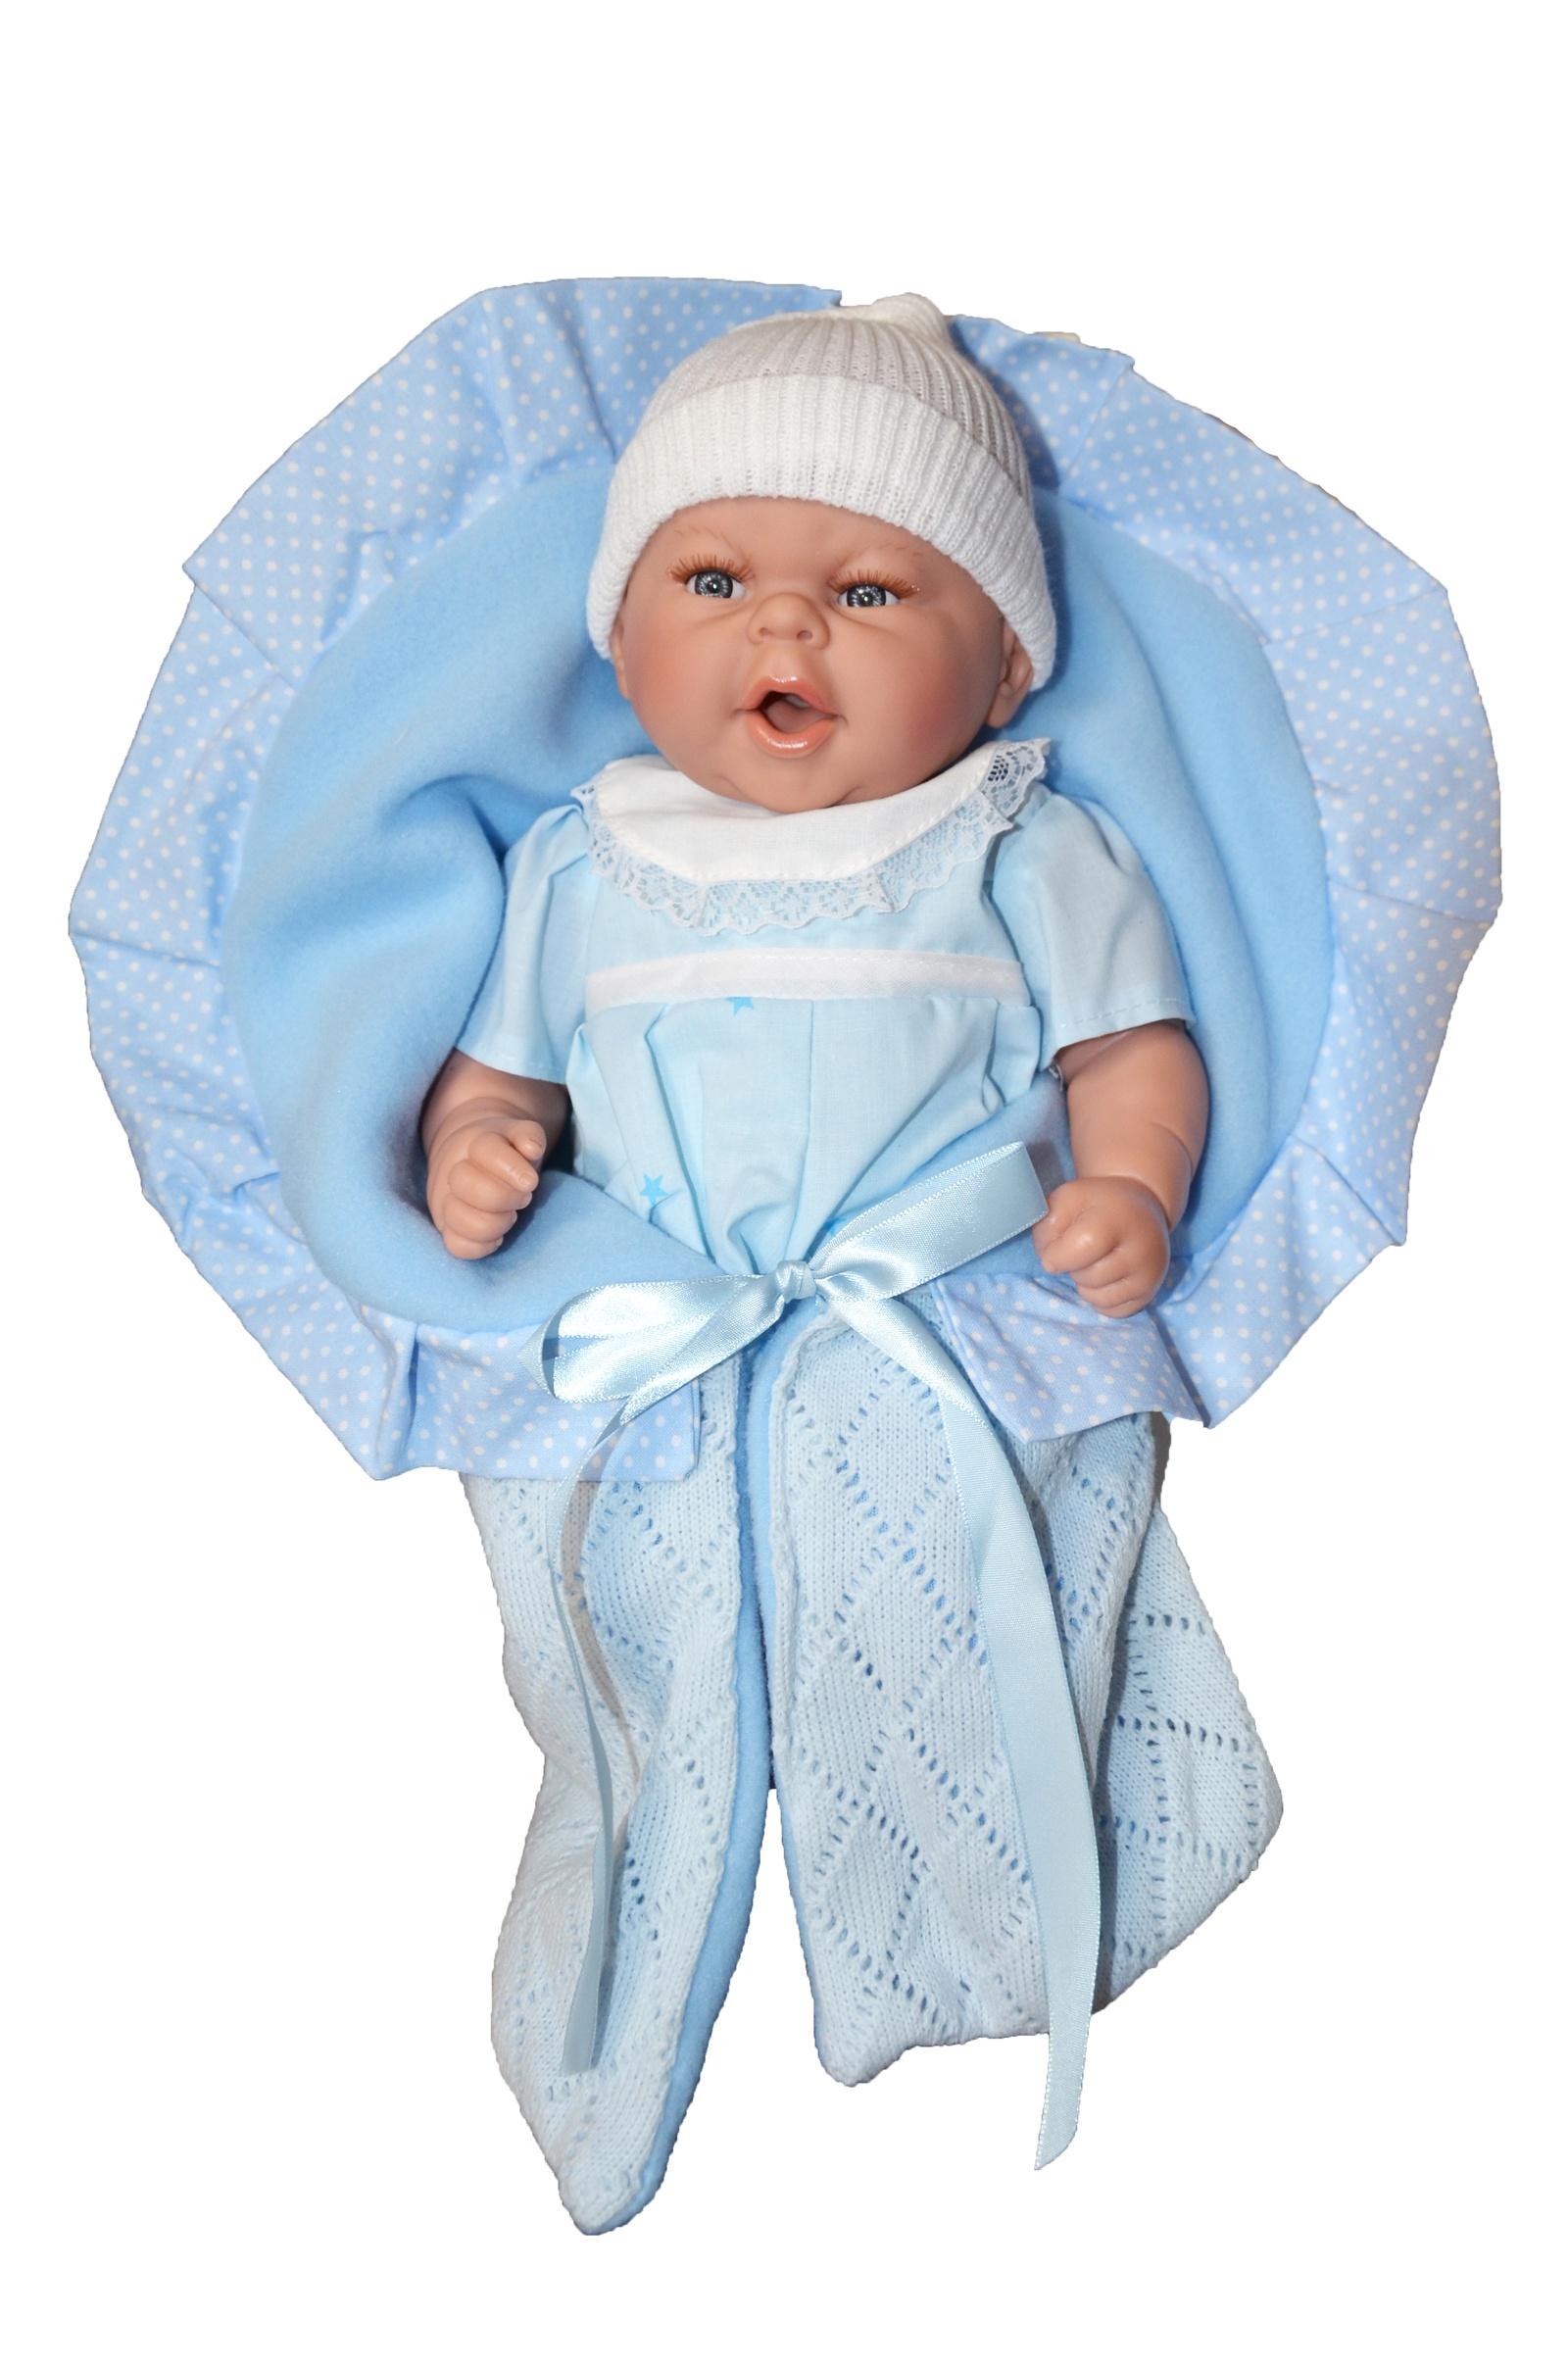 Кукла Munecas Manolo Dolls Nana Grande Thais, озвученная, 2021